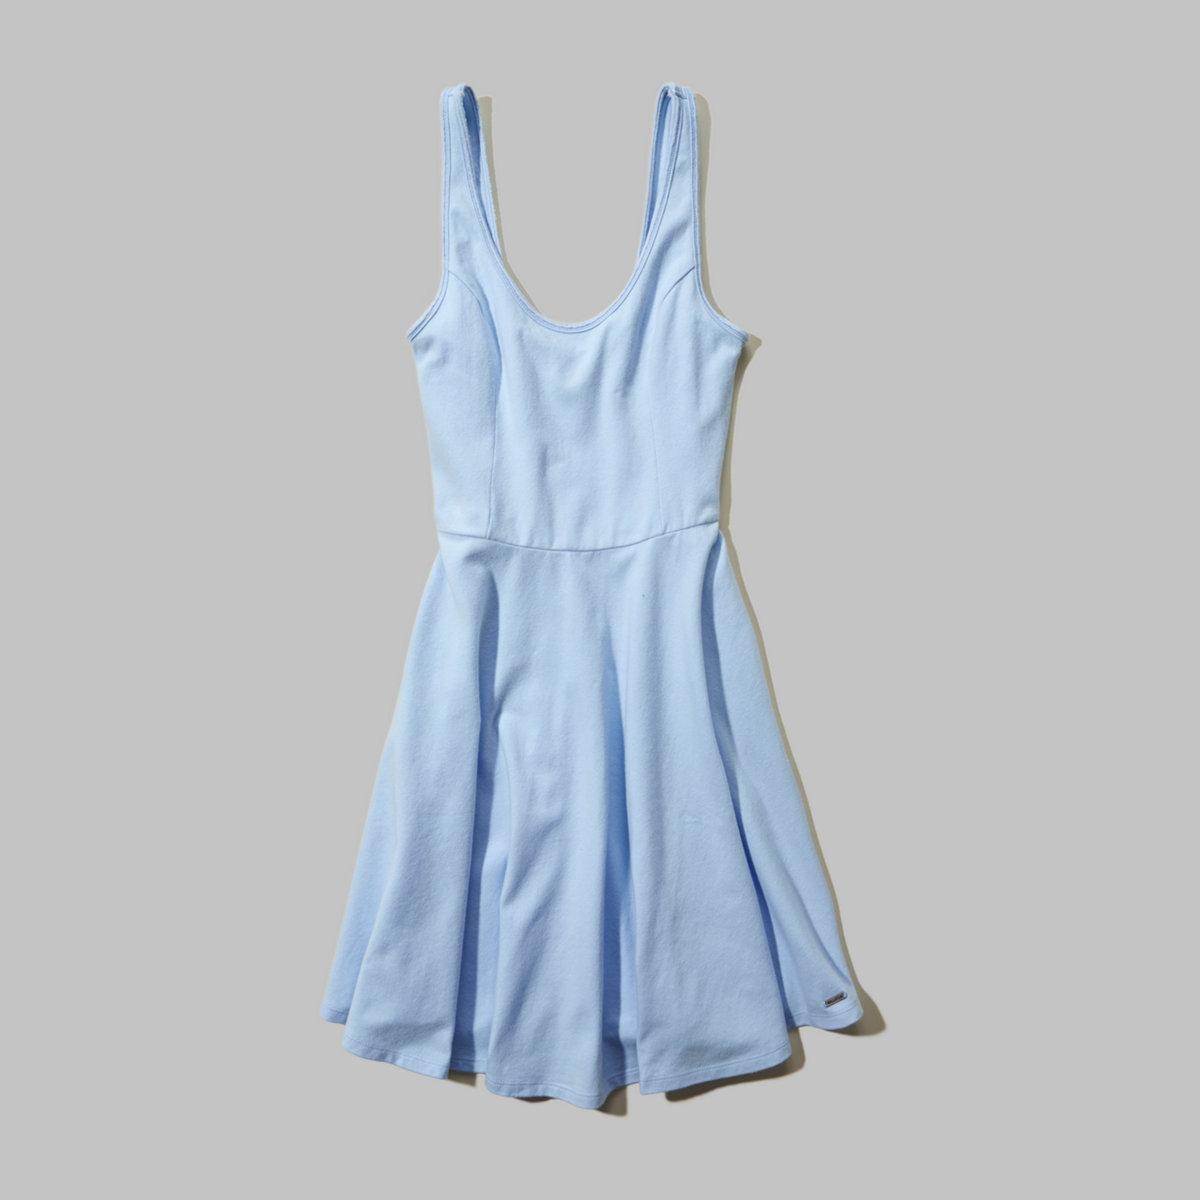 McGrath Beach Dress